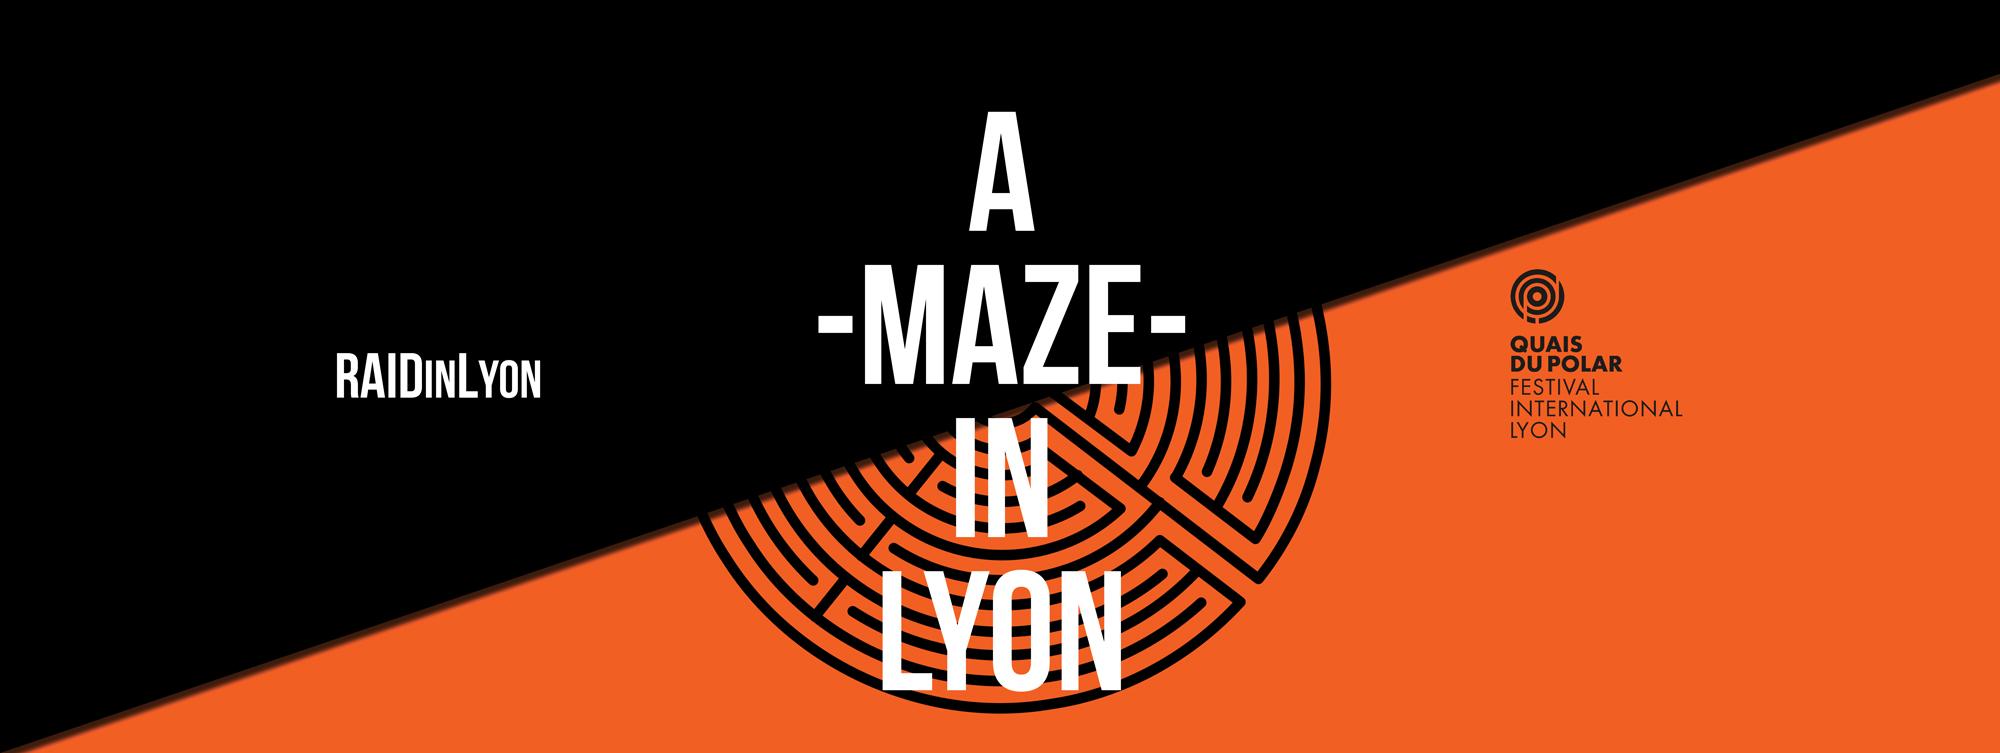 A-Maze-in-Lyon 1